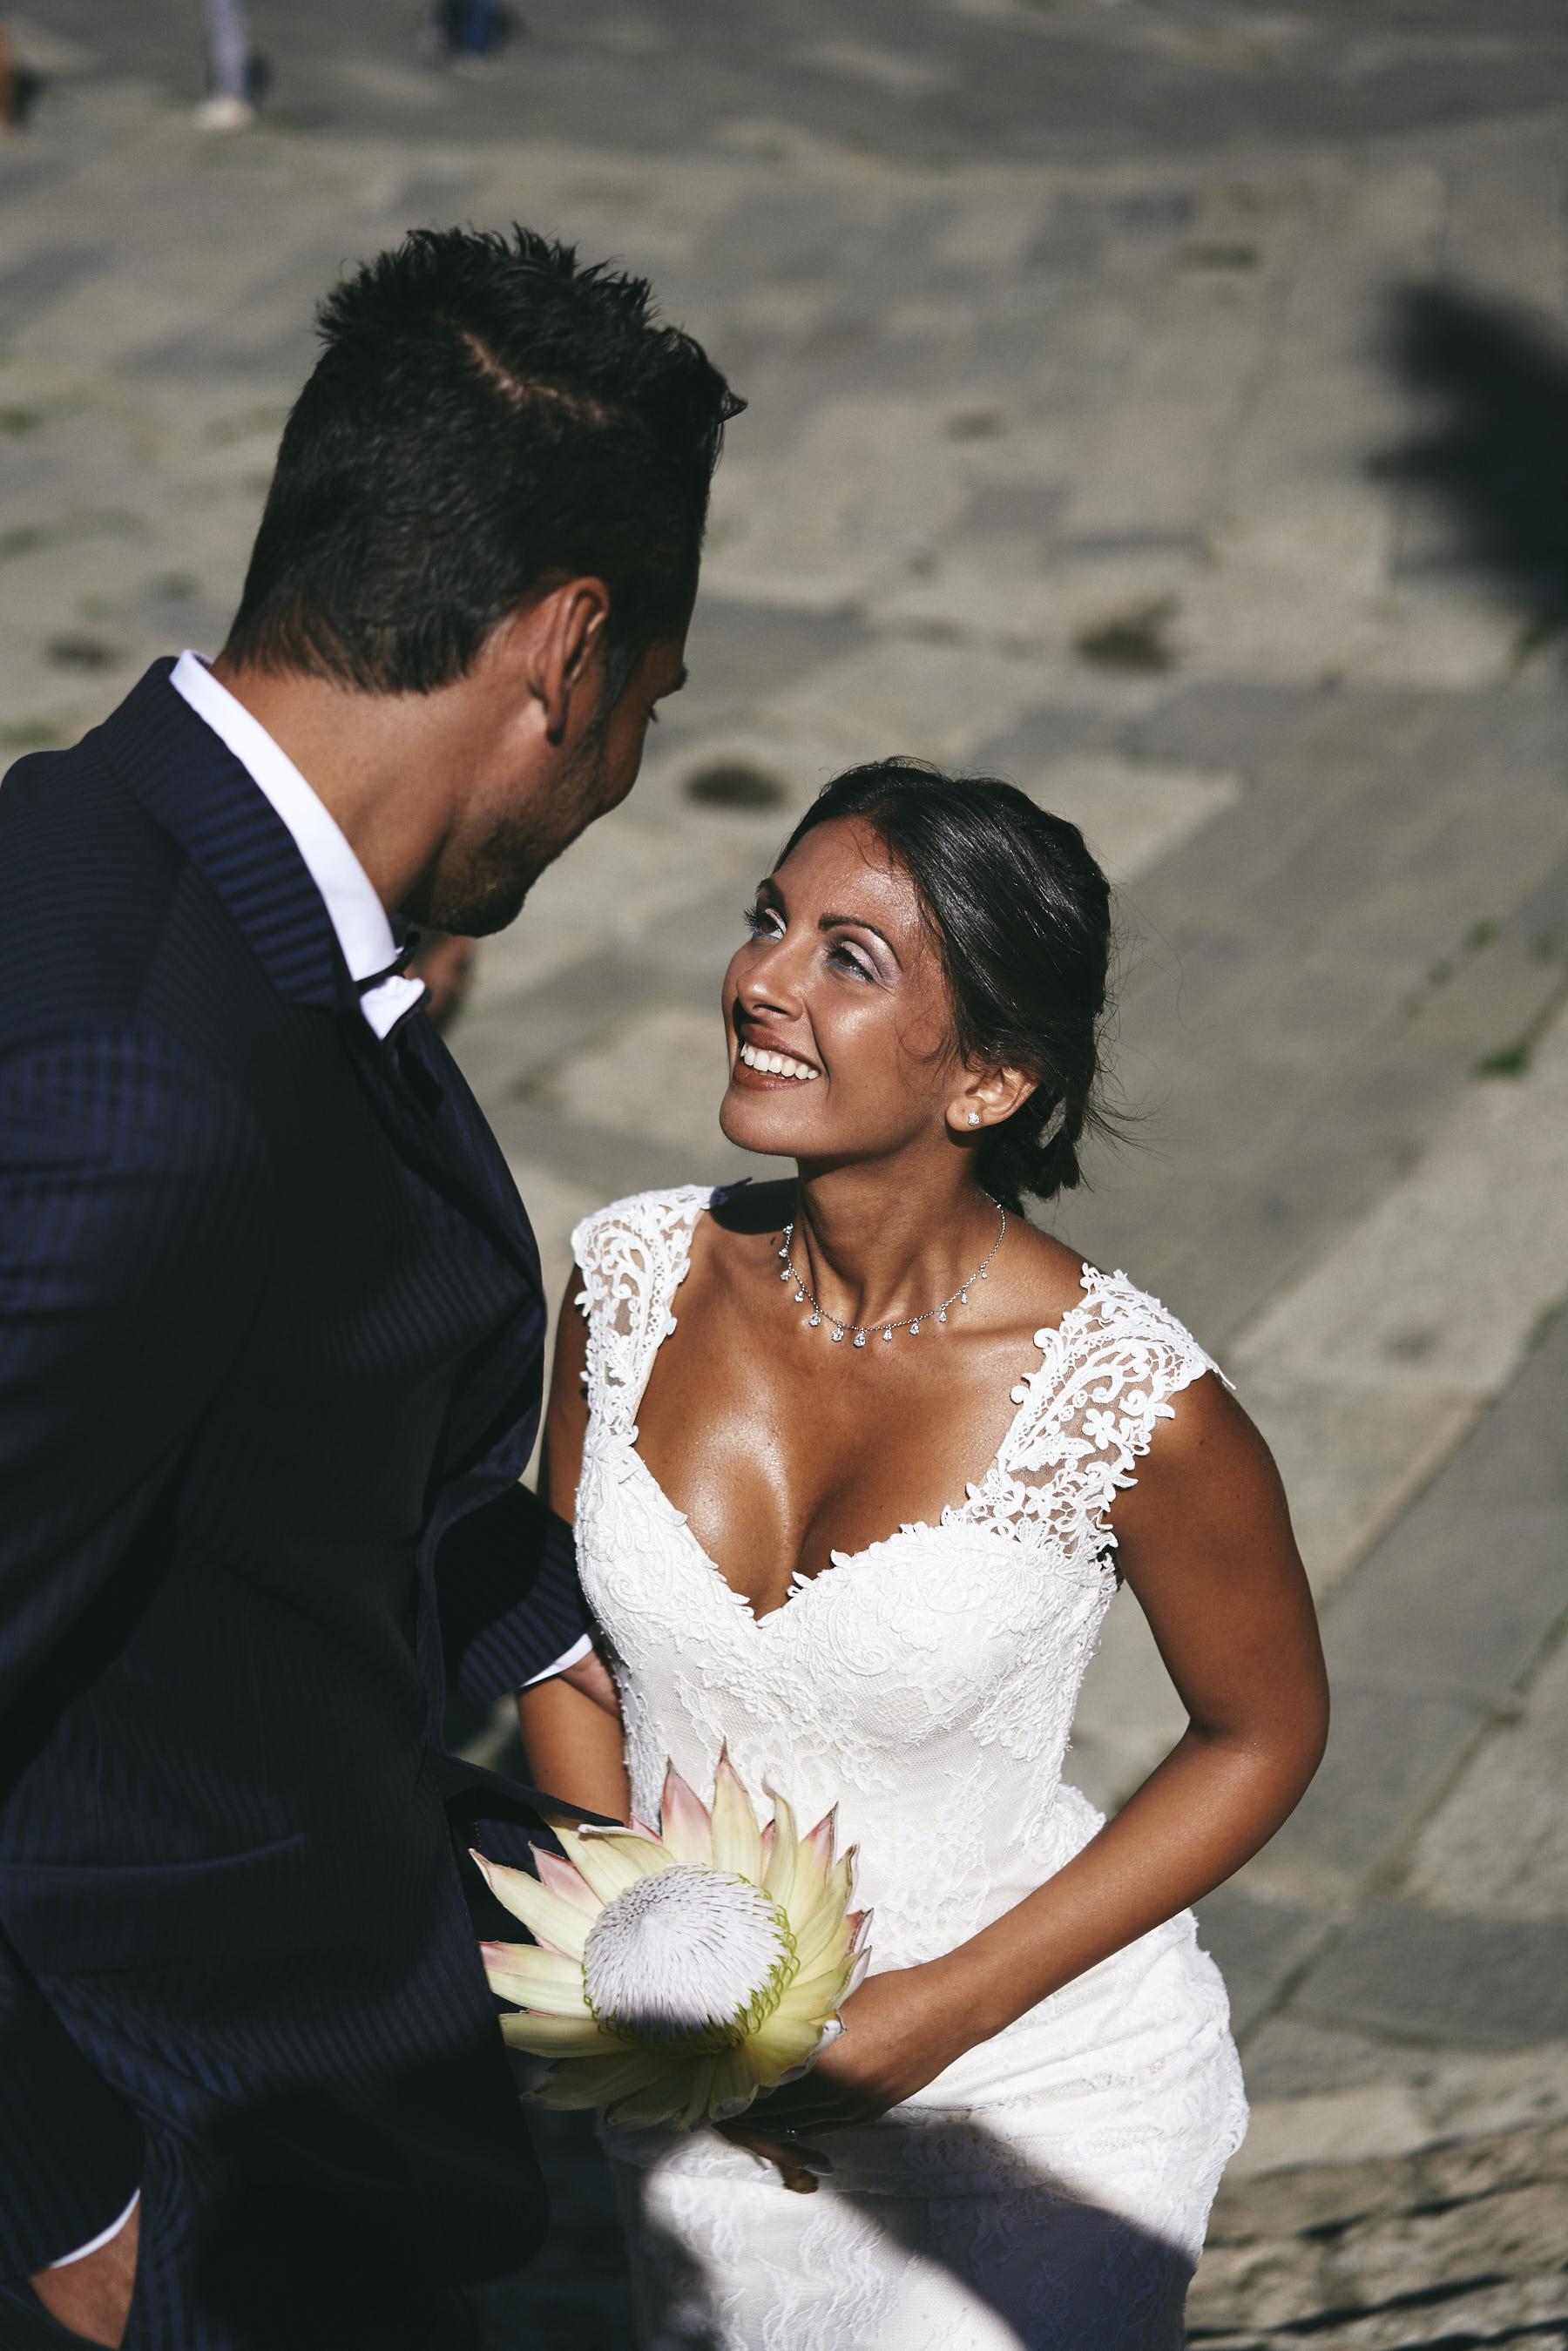 wedding_tuscany_maremma_20_frank_catucci wedding_tuscany_maremma_27_frank_catucci